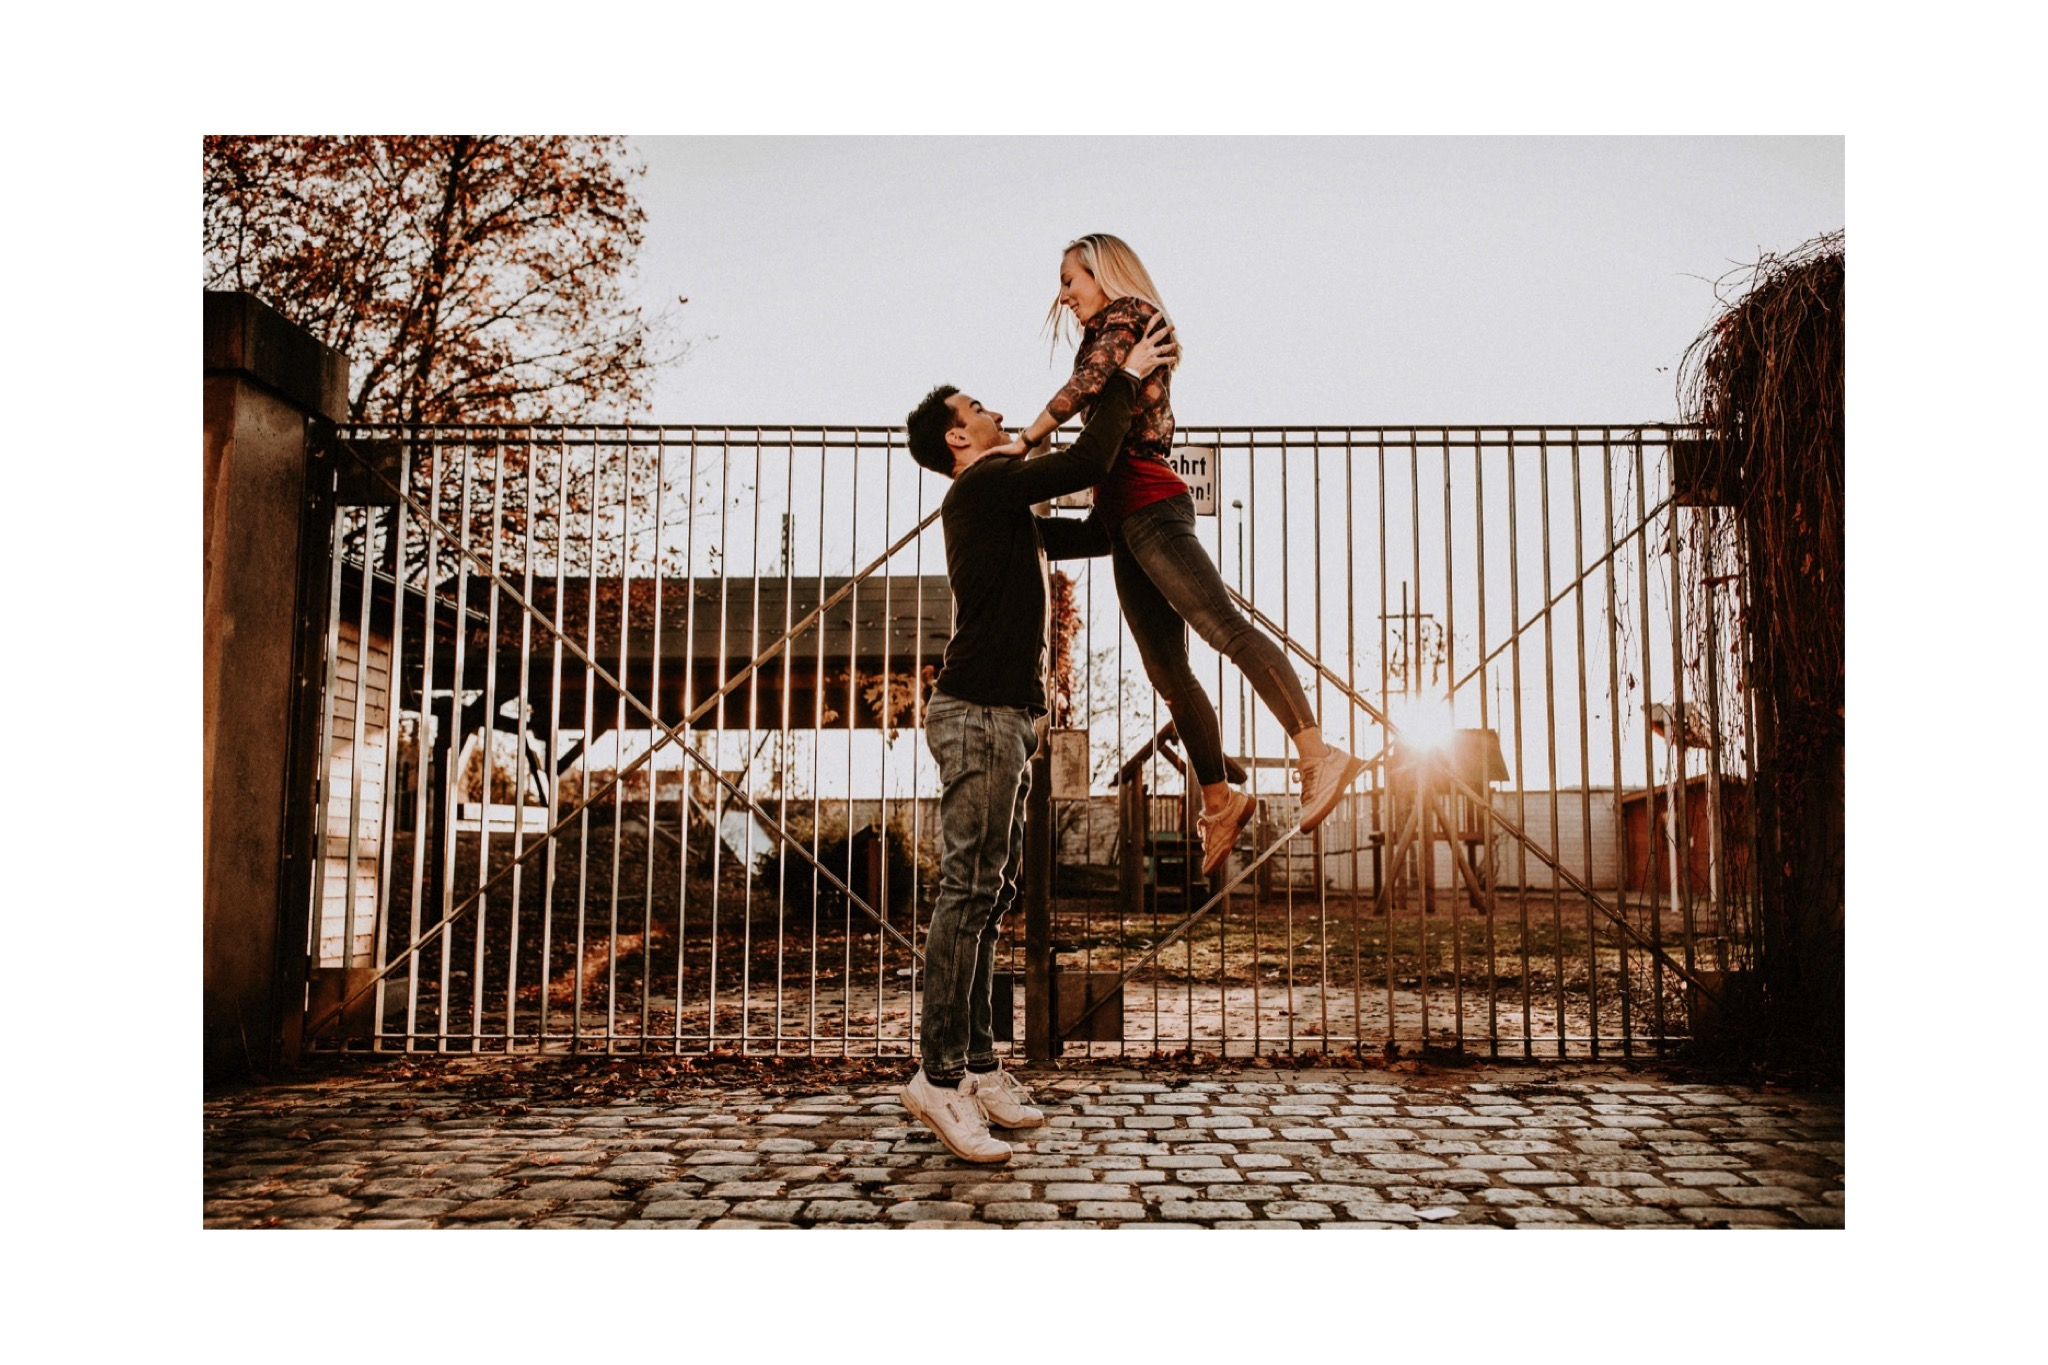 10_Carina & Fabian - Paarshooting-15_hochzeit_paarshooting_hochzeitsfotograf_nürnberg_intimatecouple.jpg